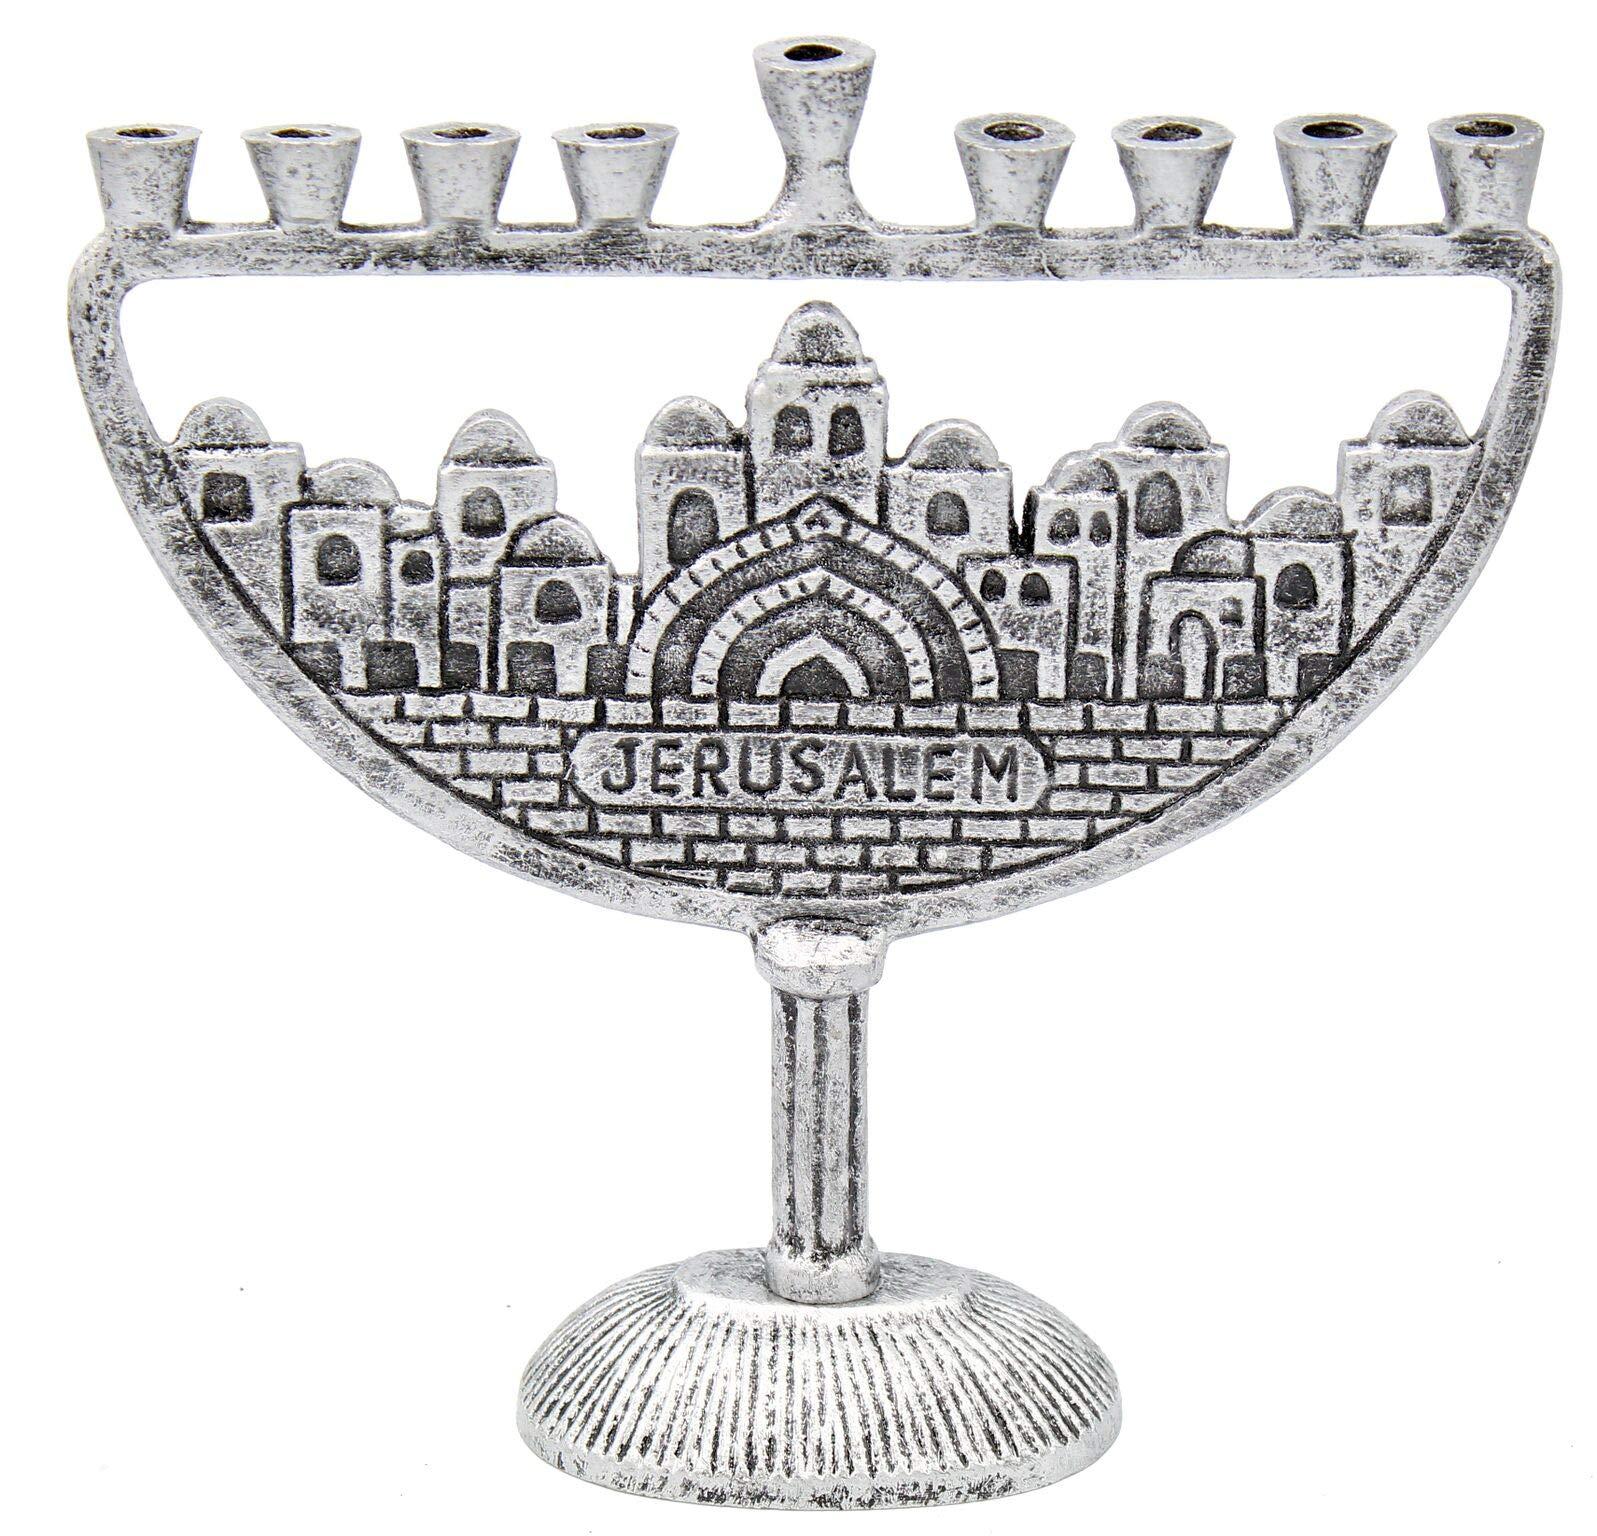 Hanukkah  Menorah Jerusalem Old City Antique Silver Finish by The Dreidel Company